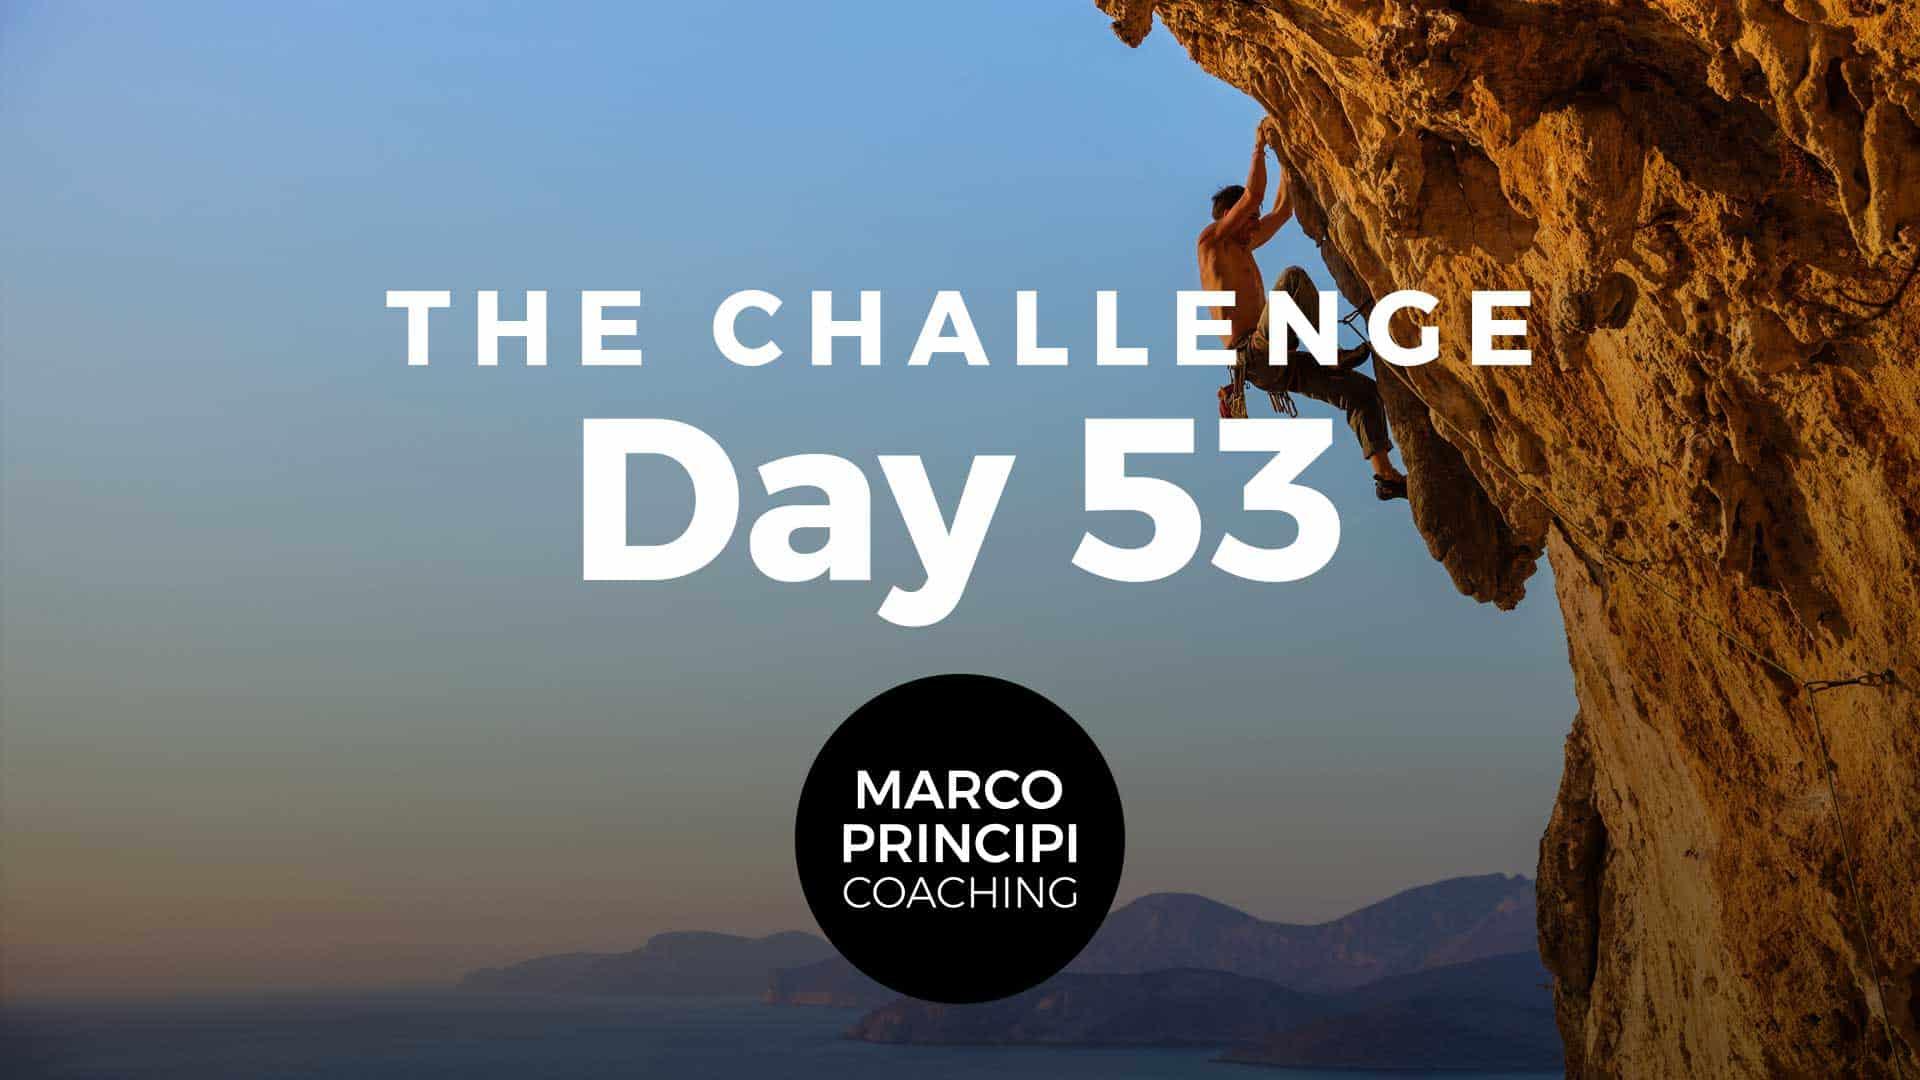 Marco Principi The Challenge Day 53